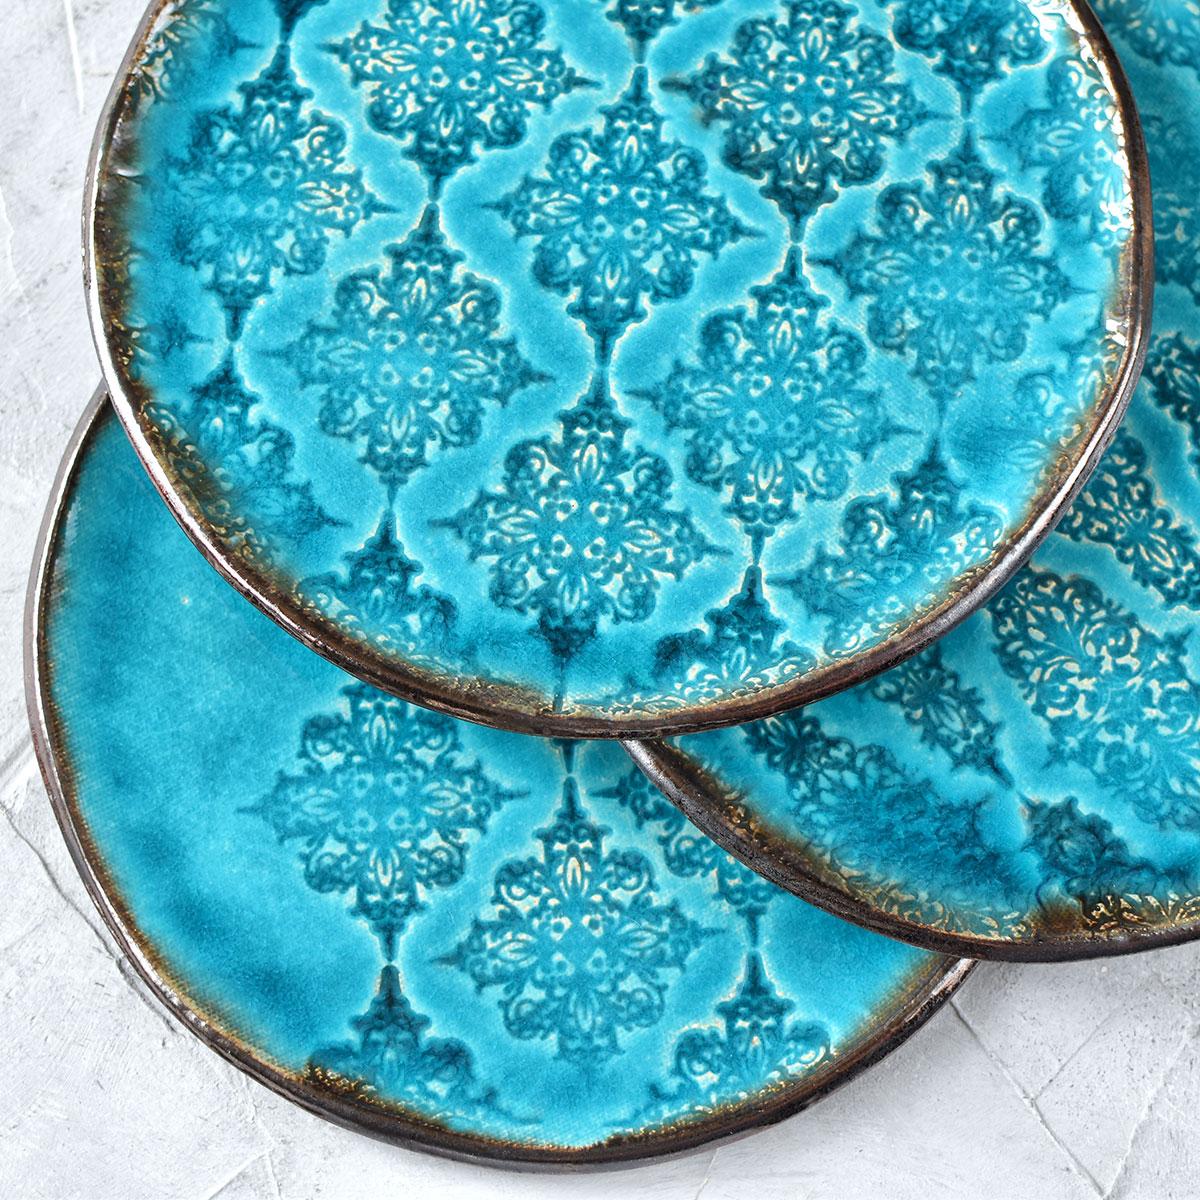 картинка Бирюзовая тарелка с узорами 1 - DishWishes.Ru